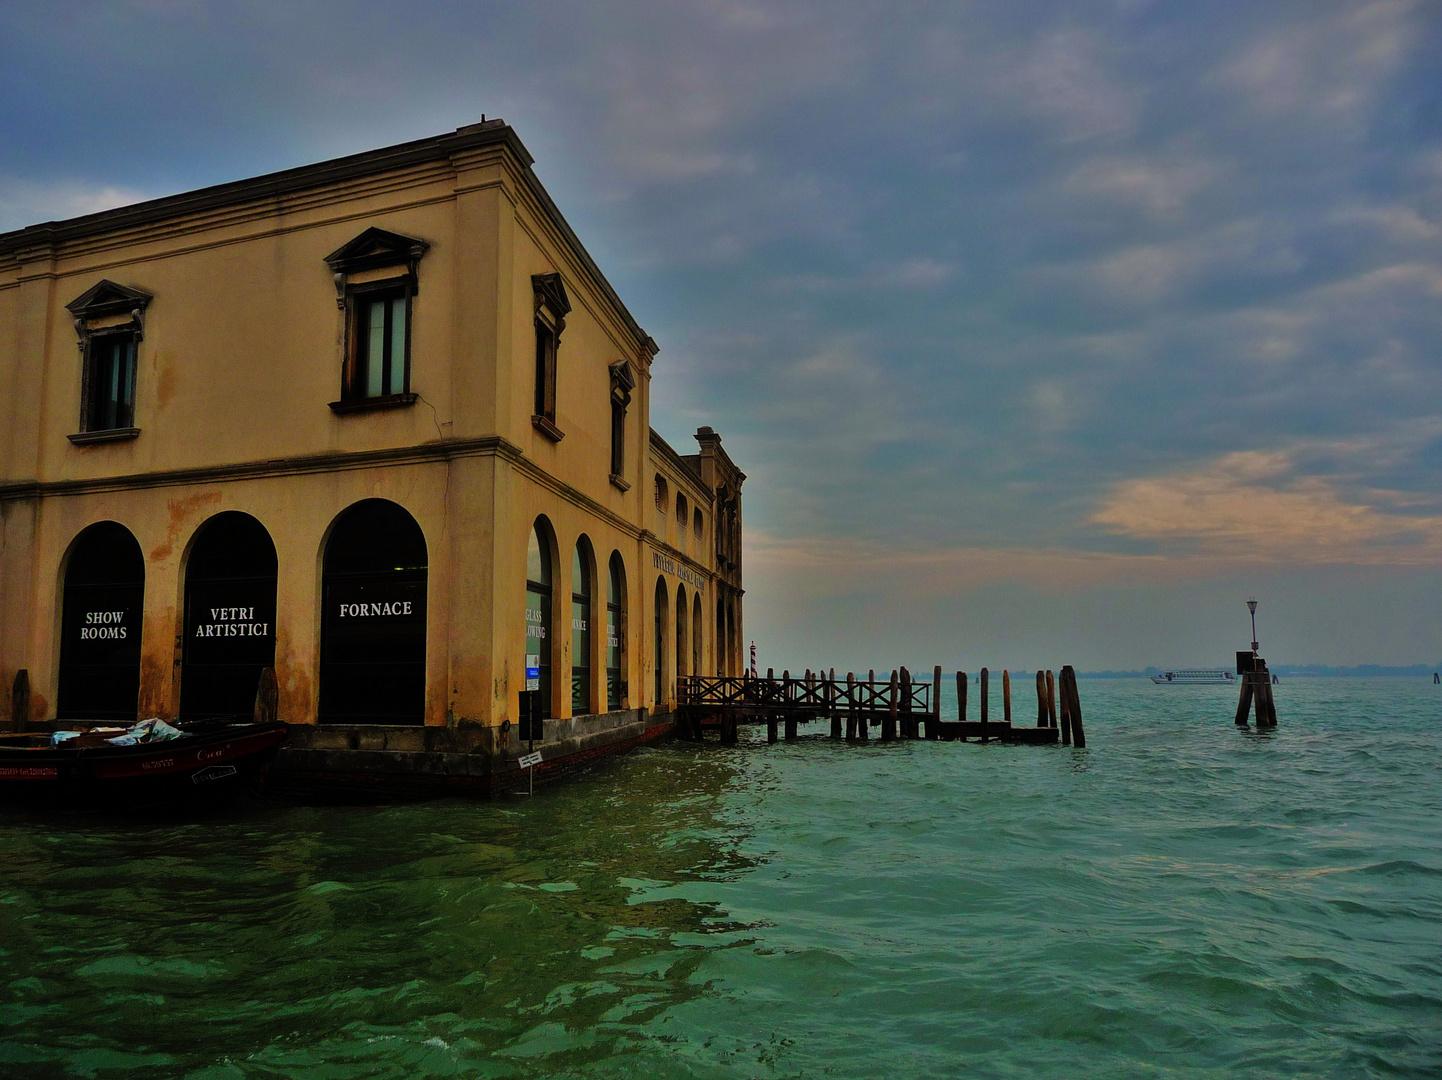 Fabrica en Murano